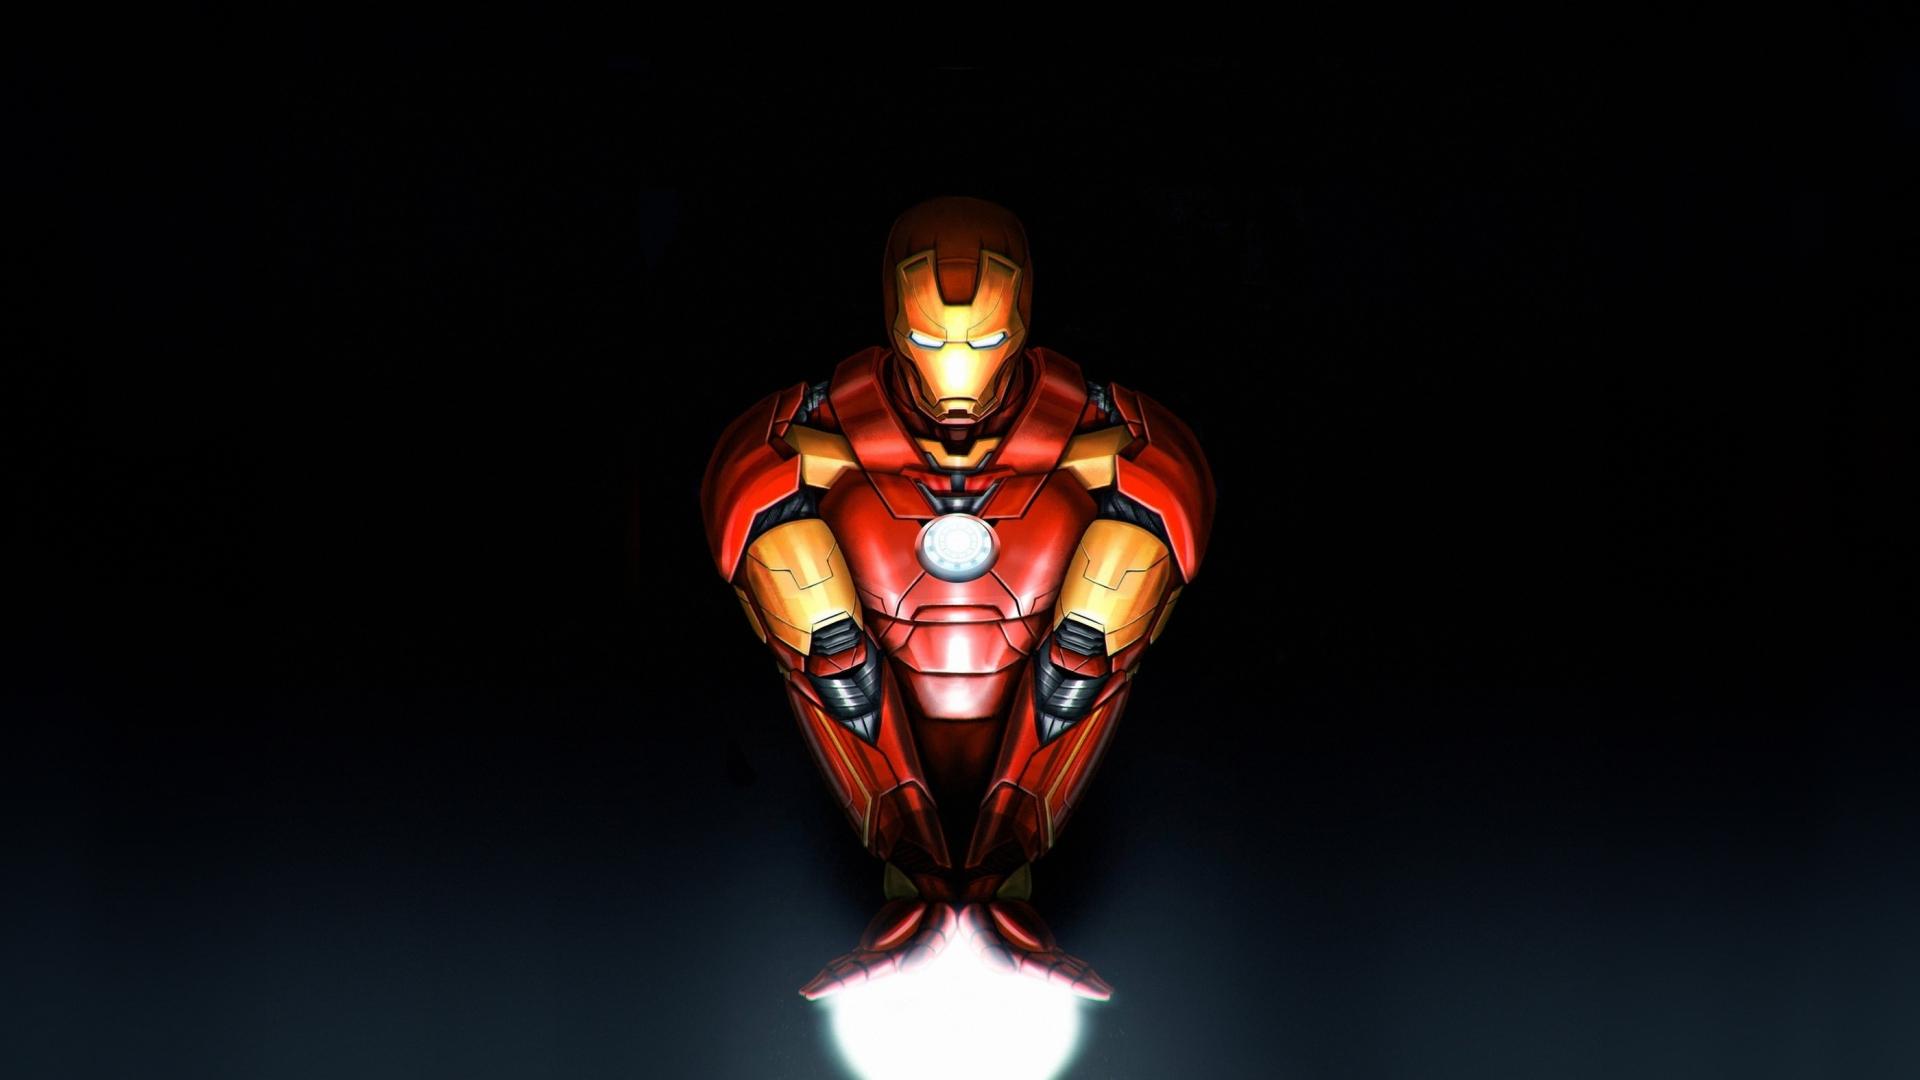 Download 1920x1080 Wallpaper Iron Man Old Suit Artwork